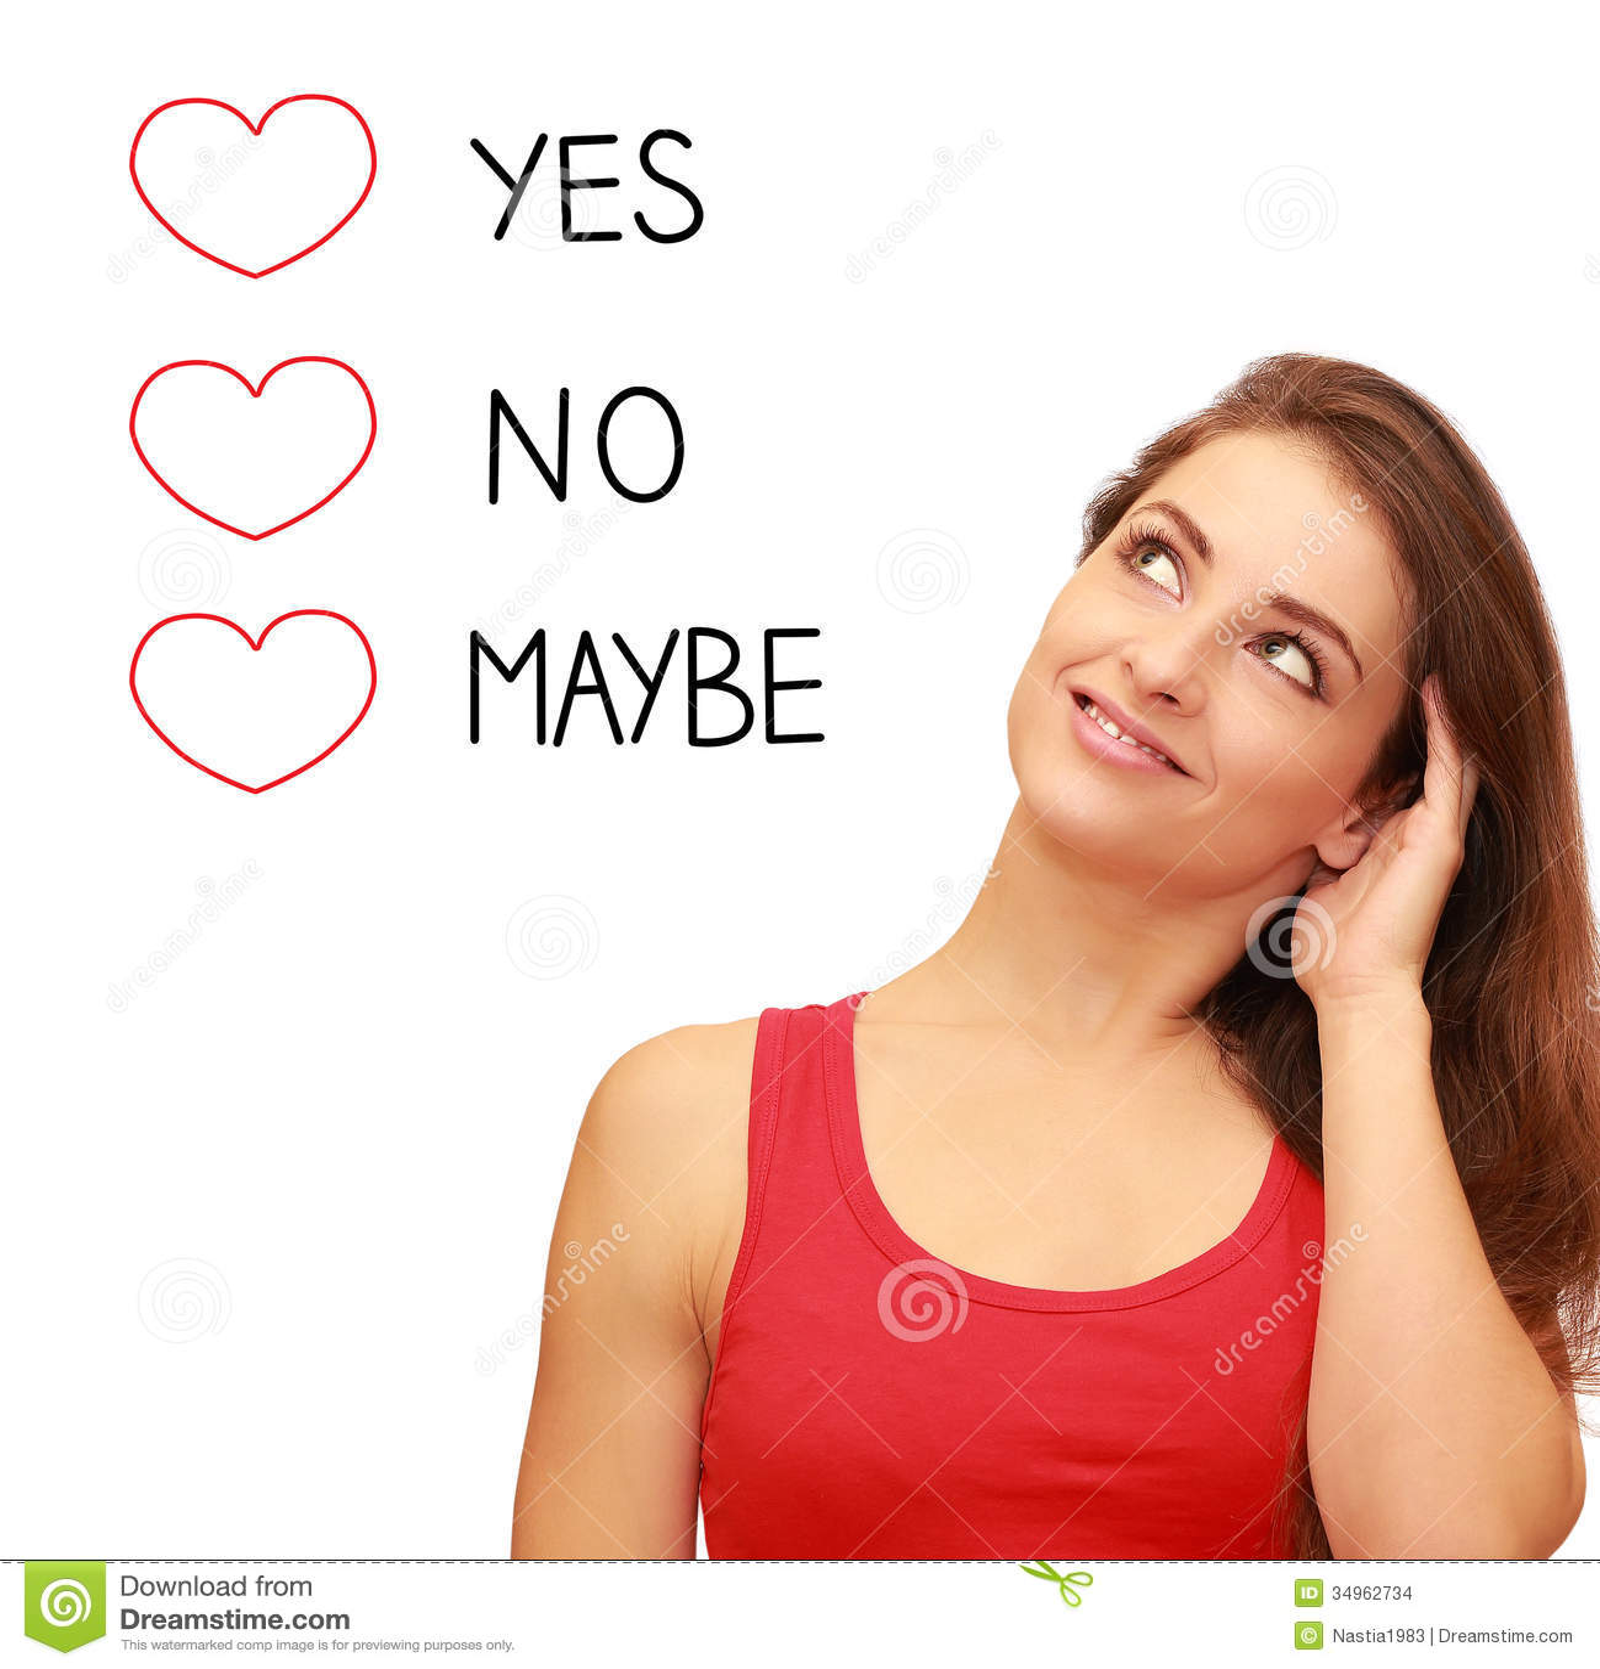 Free Sms Dating Uk